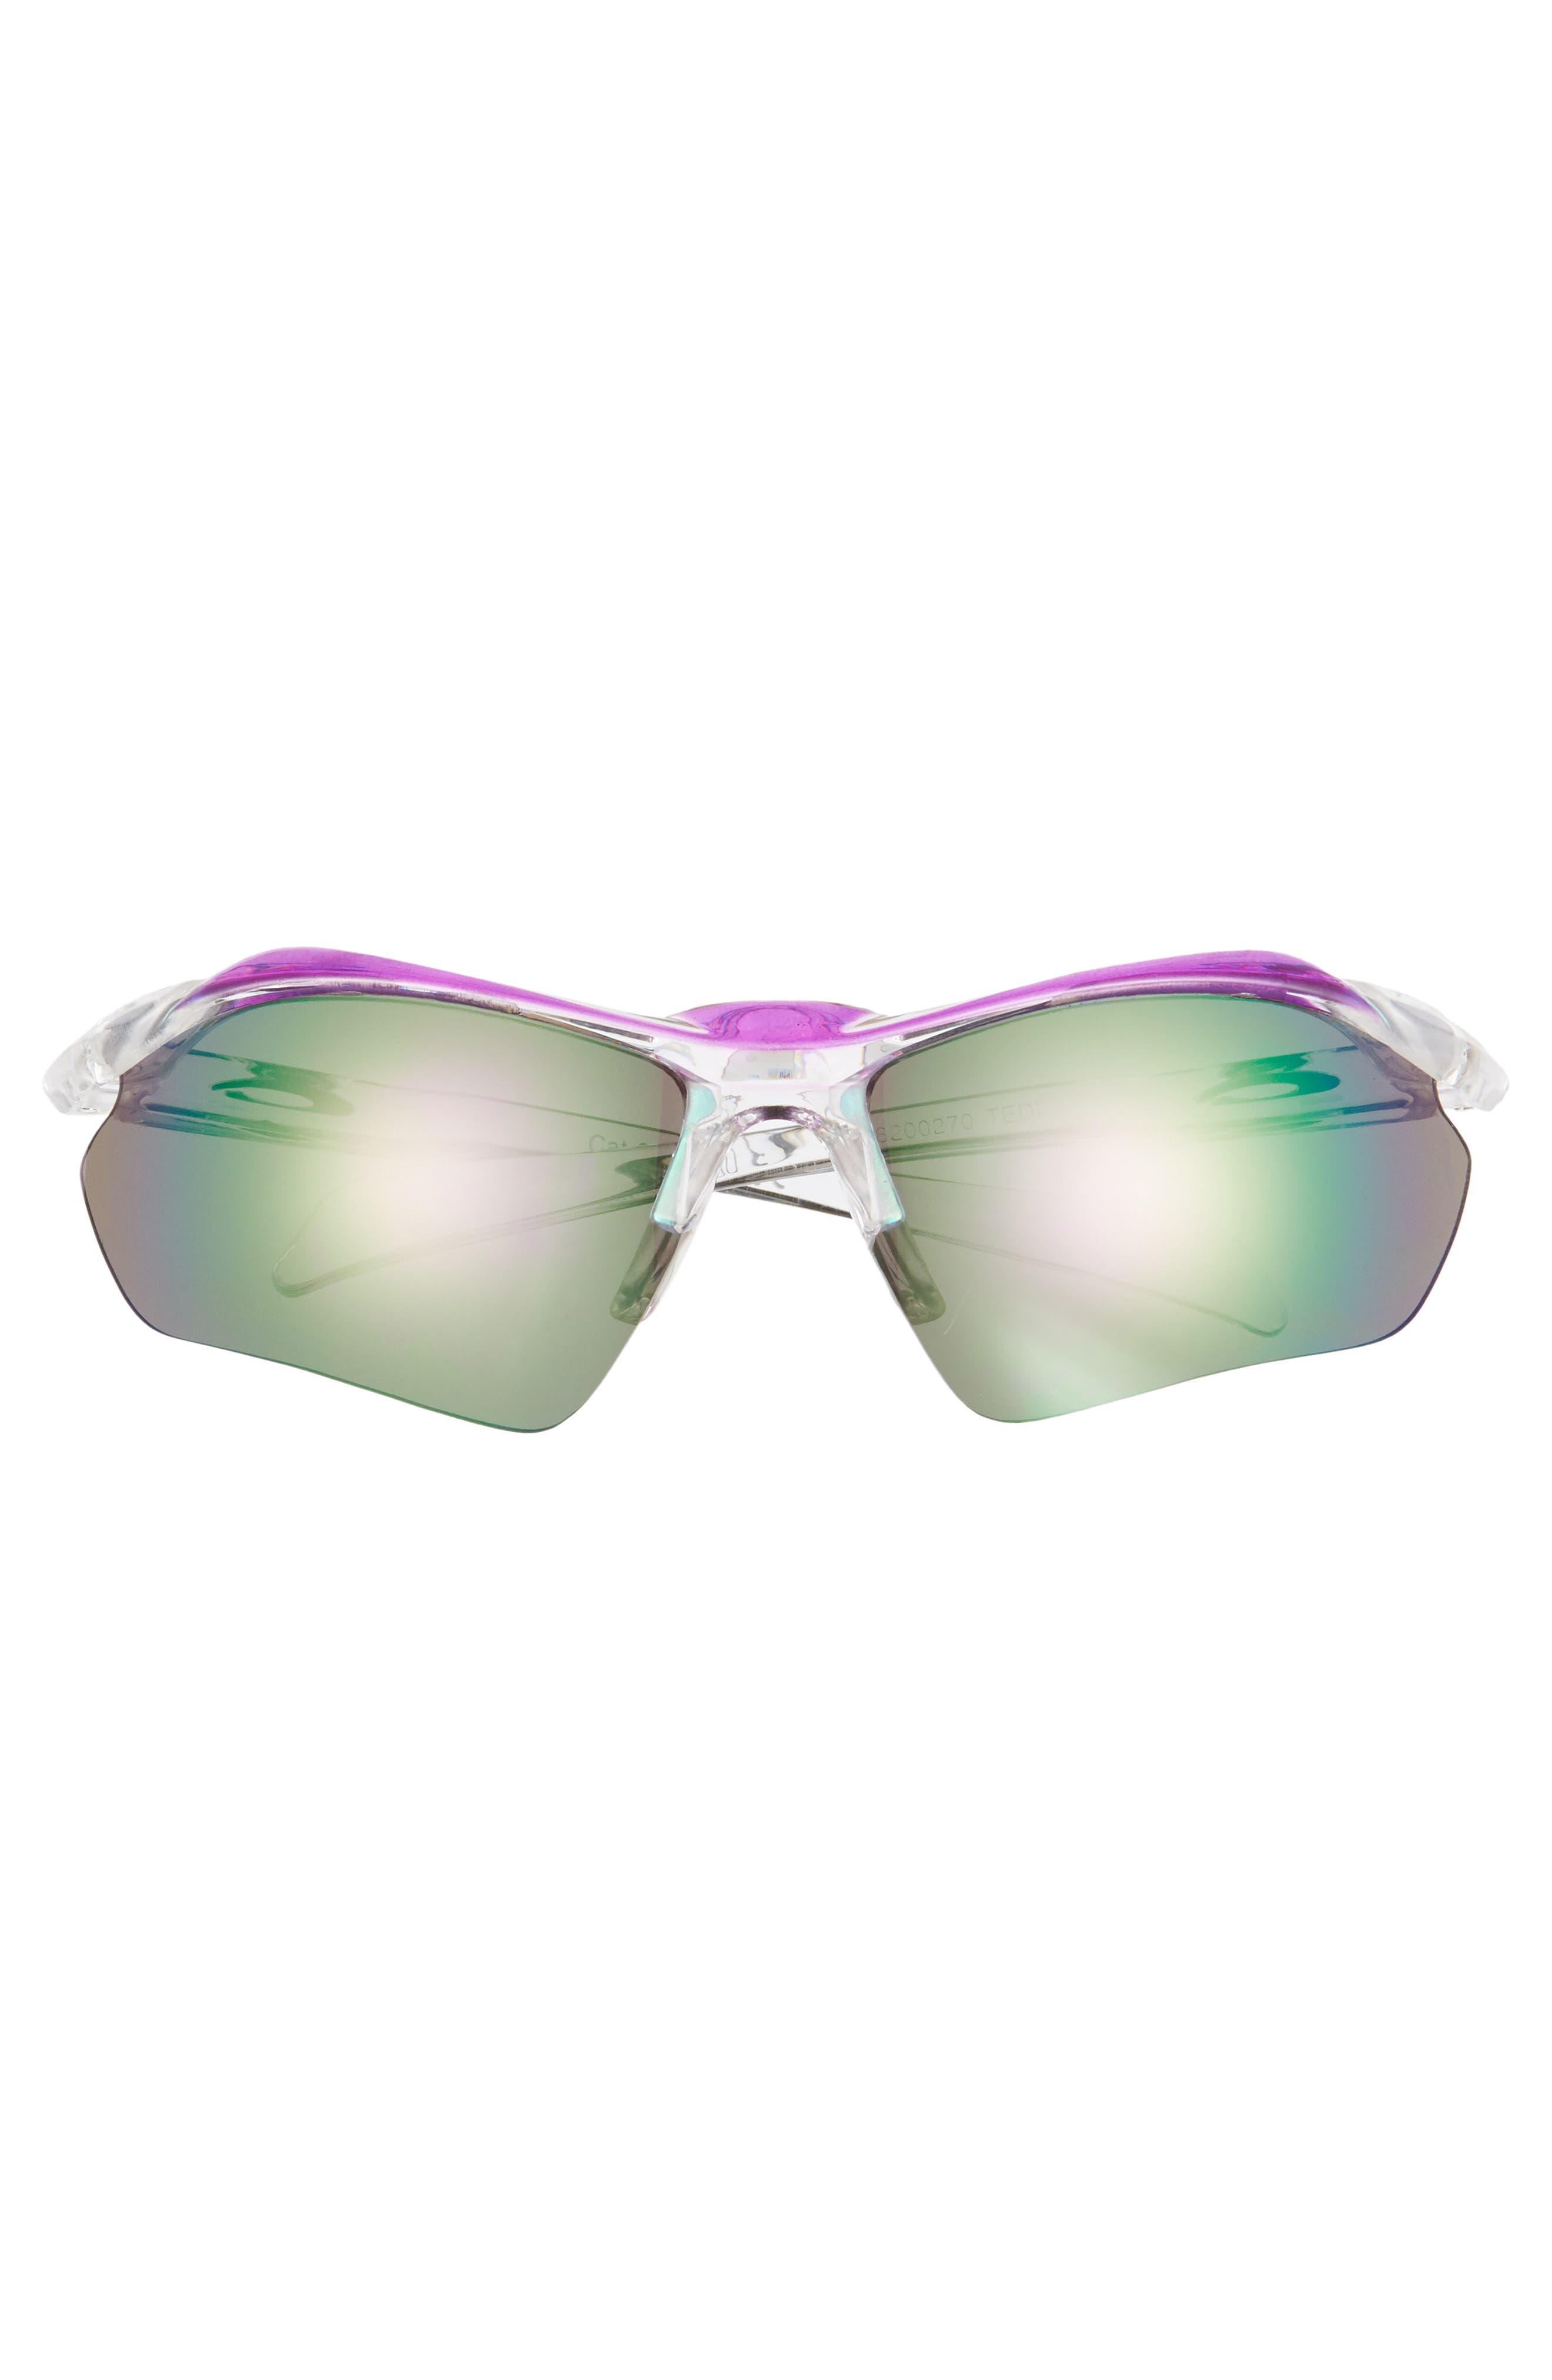 68mm Sport Shield Sunglasses,                             Alternate thumbnail 3, color,                             CLEAR/ PURPLE